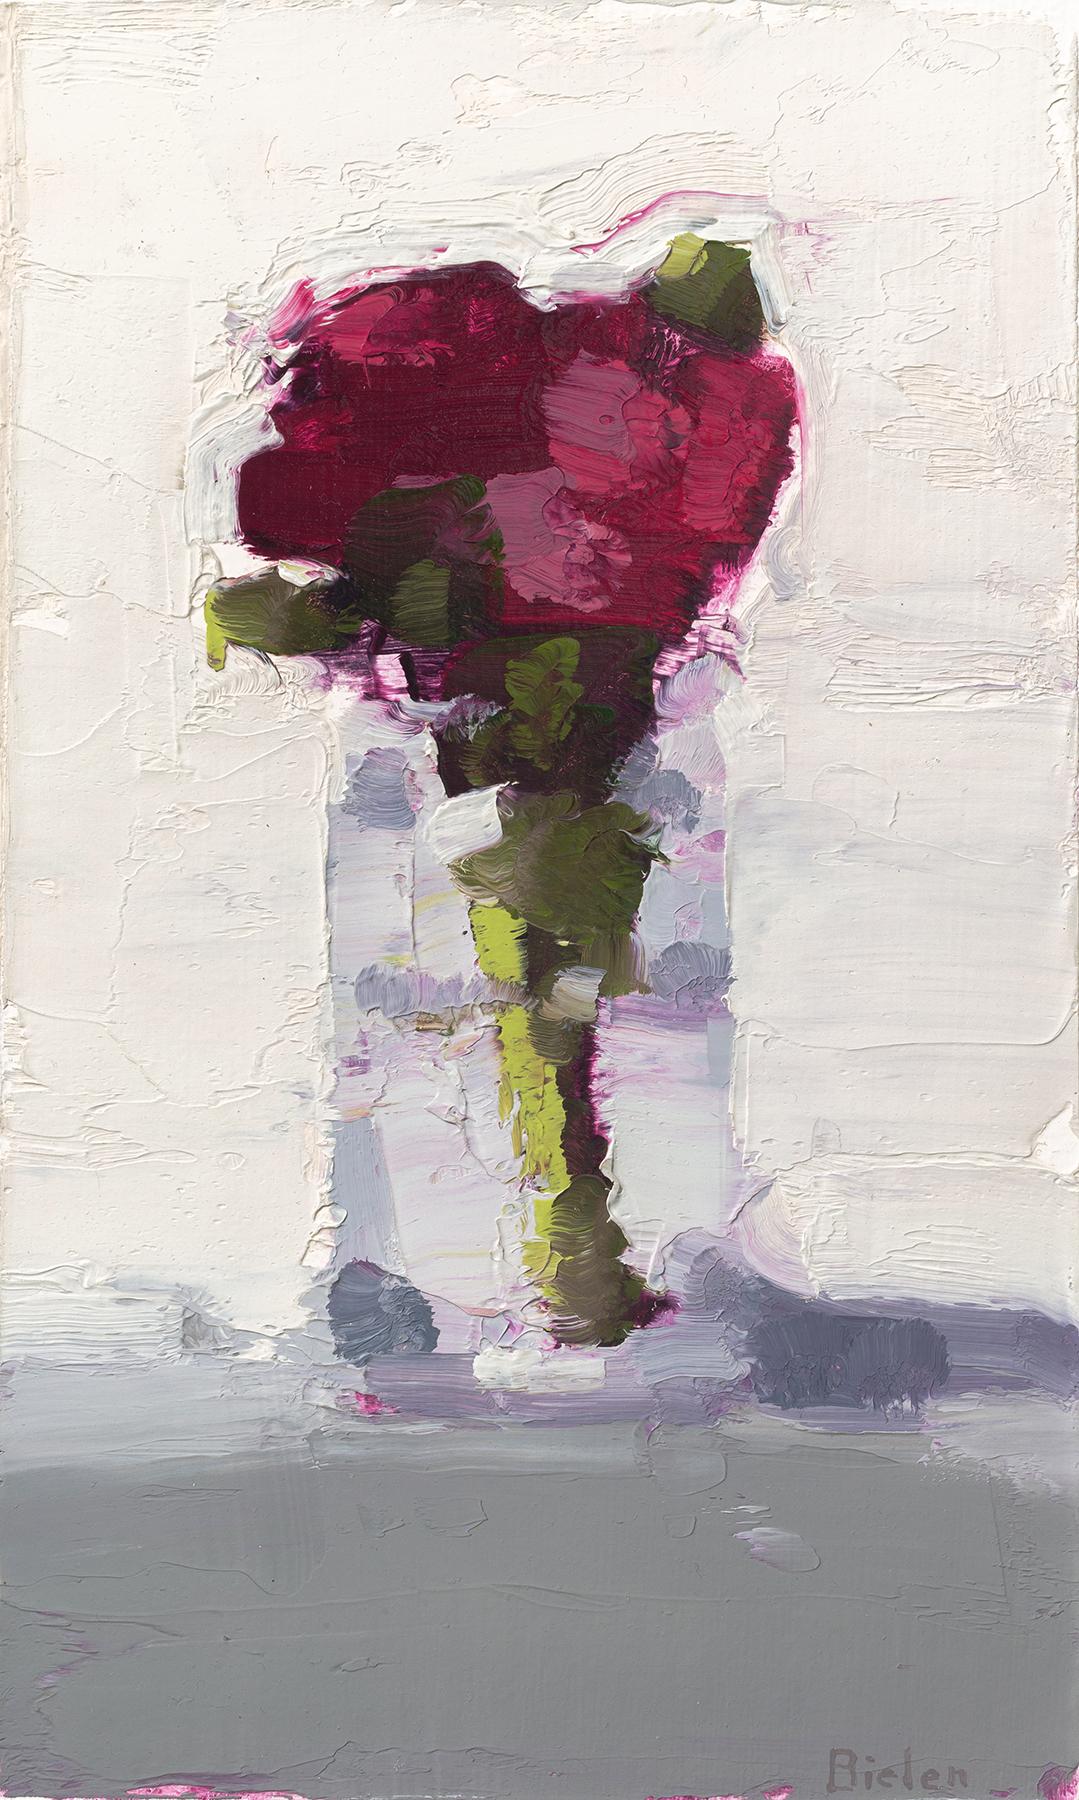 Bielen_Magenta Rose Blossoms.jpg